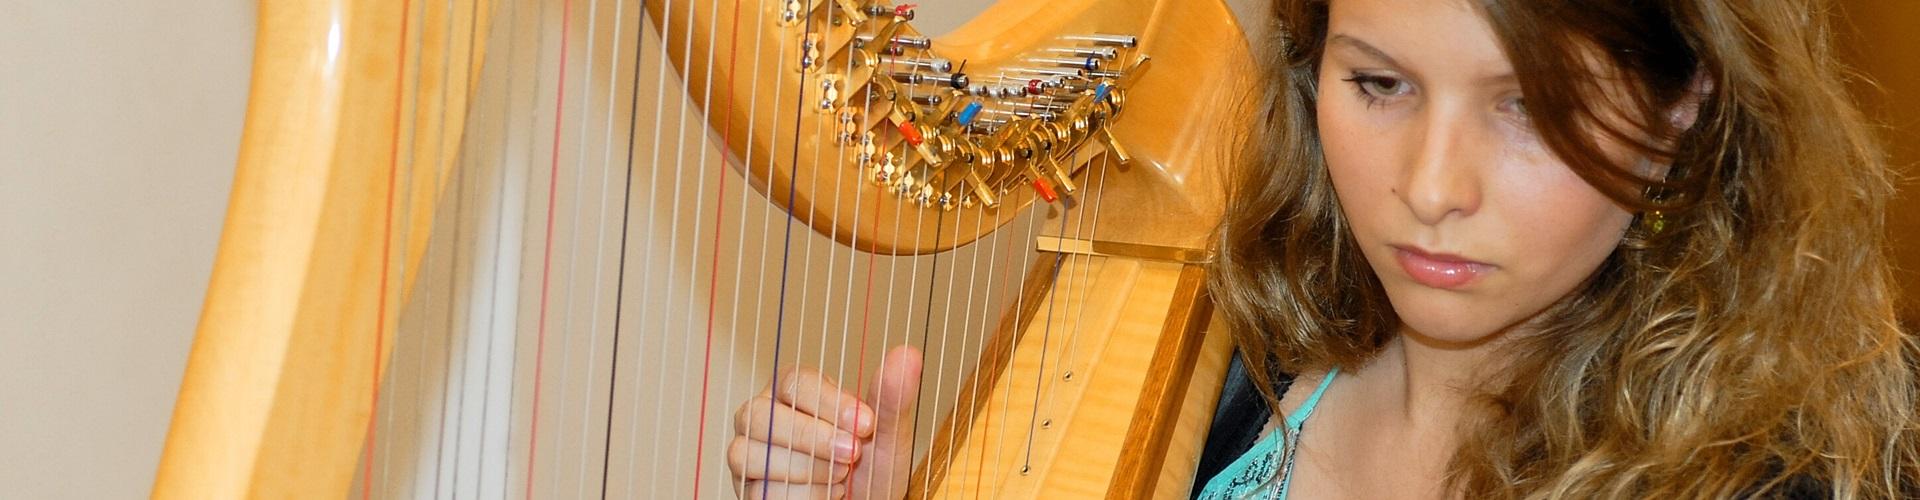 Harfe lernen, Harfenunterricht